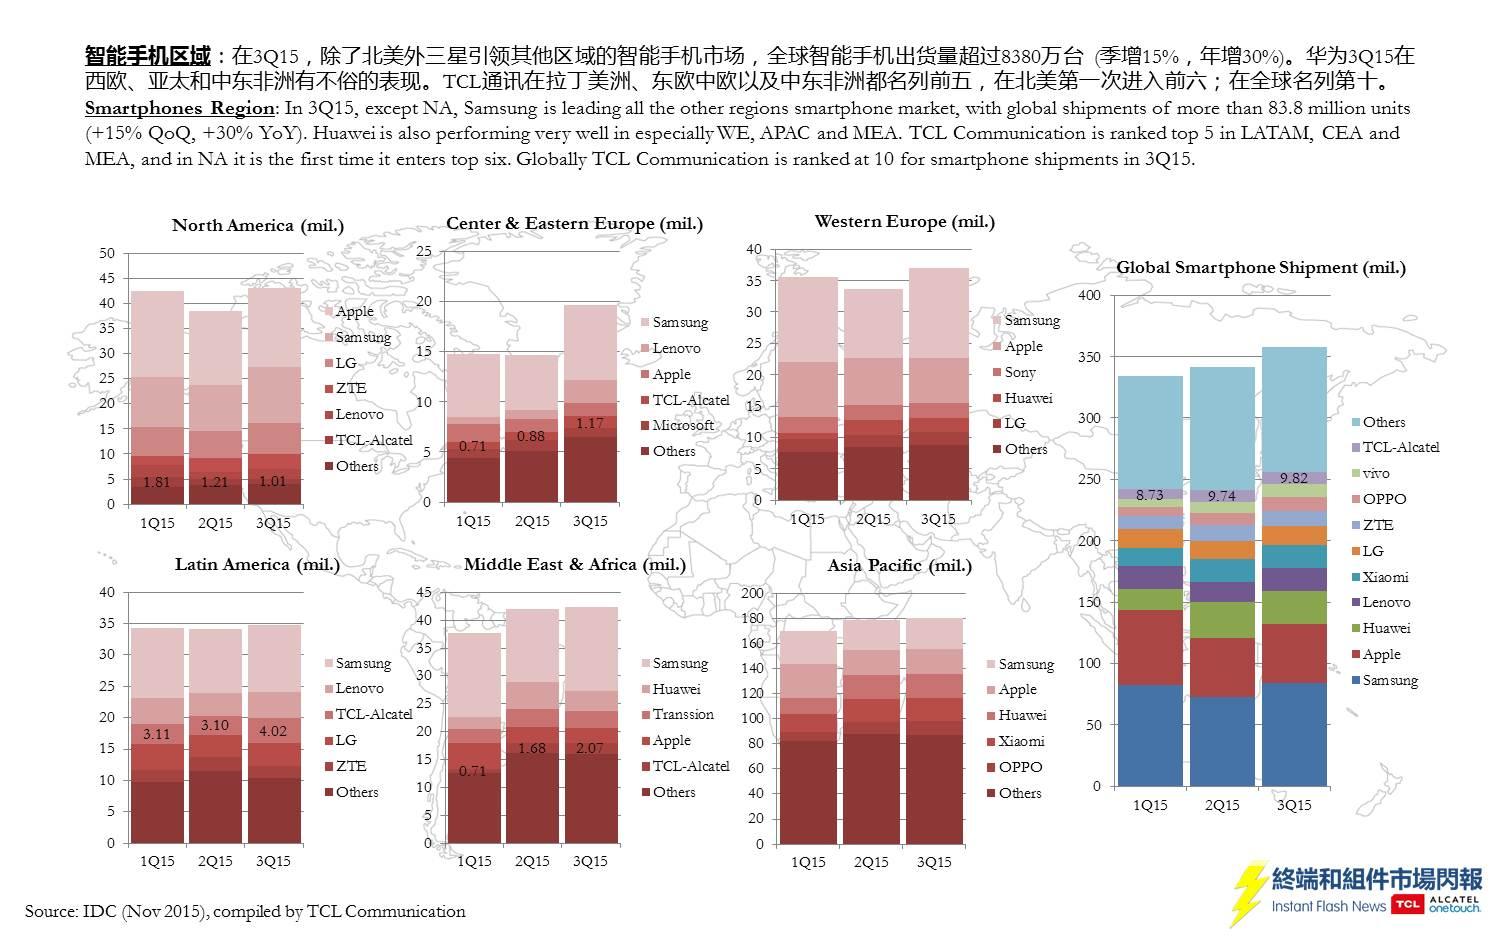 idc-share-3q15-slide3